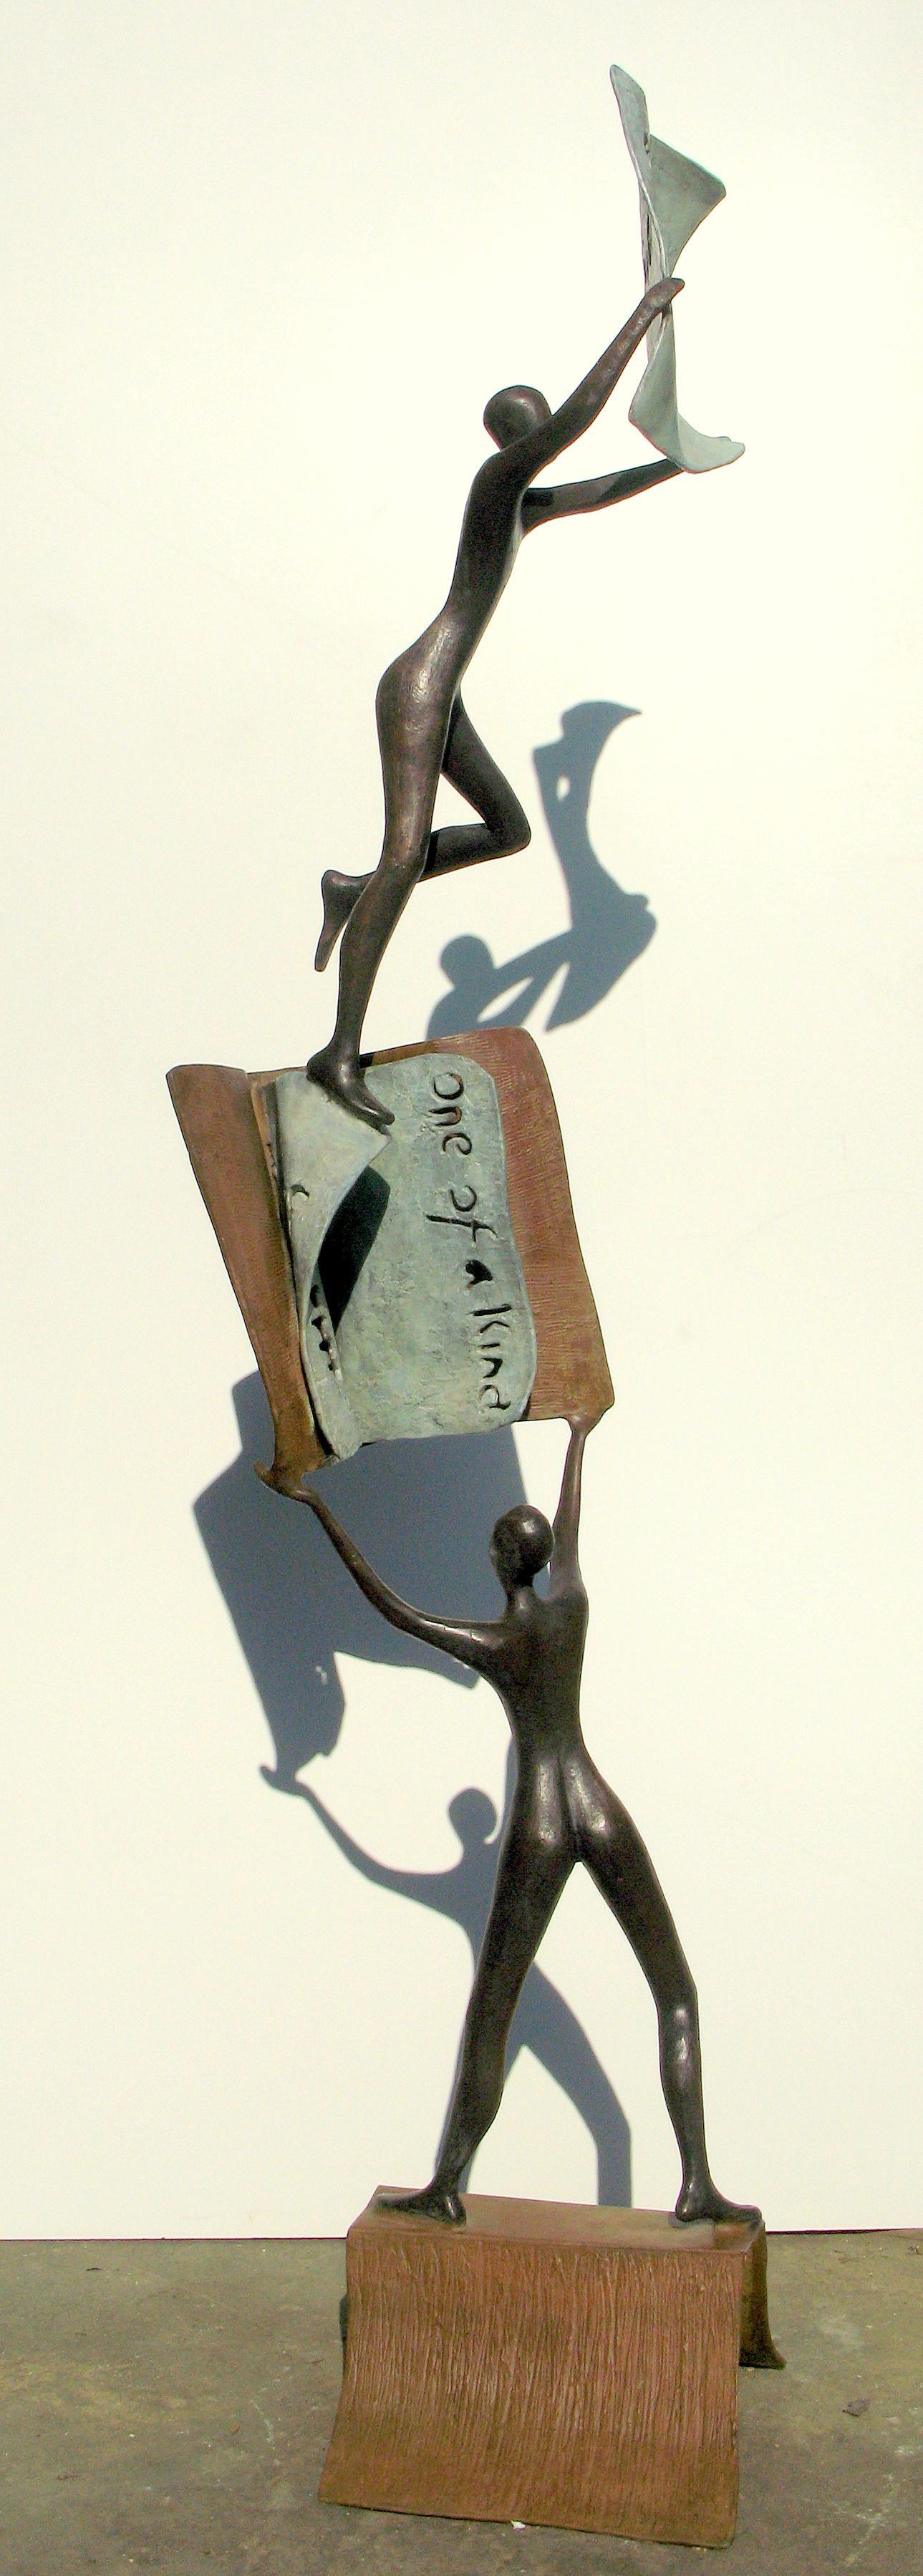 Tolla Inbar, My first book, Bronze sculpture